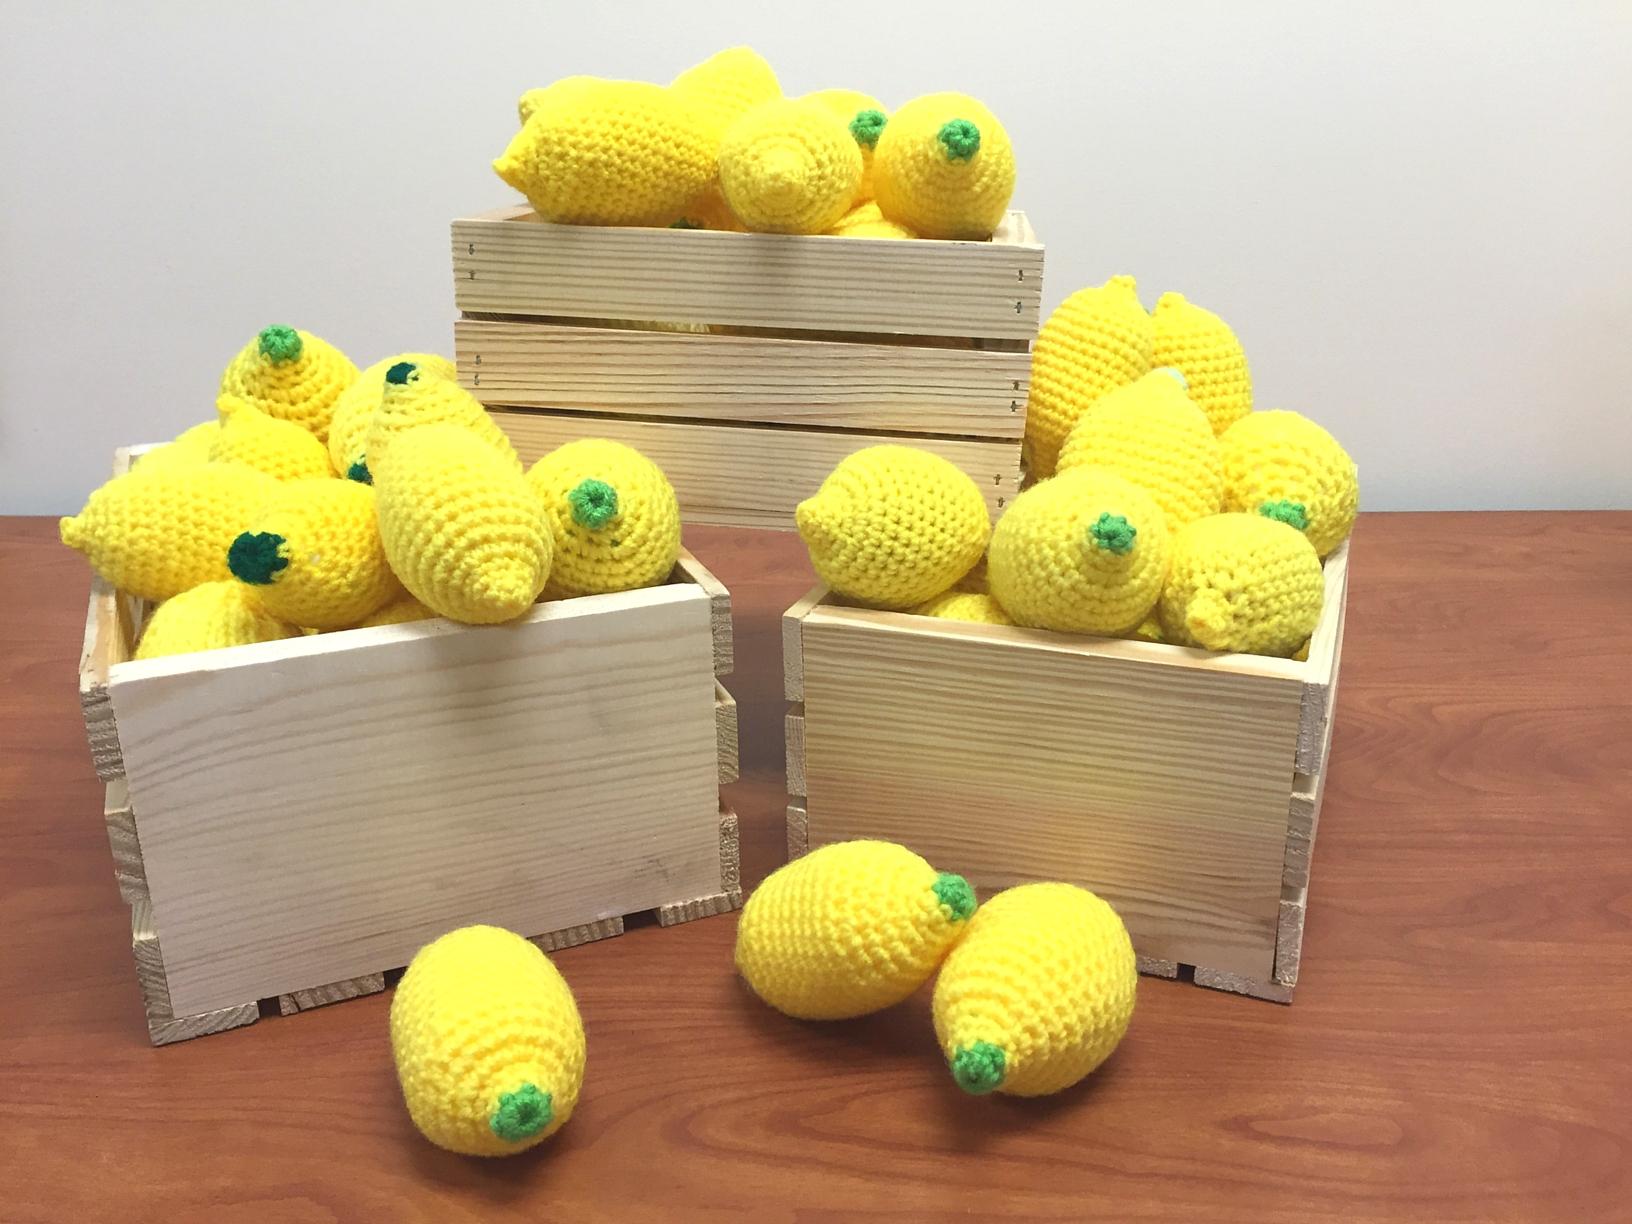 big apple lemon drive